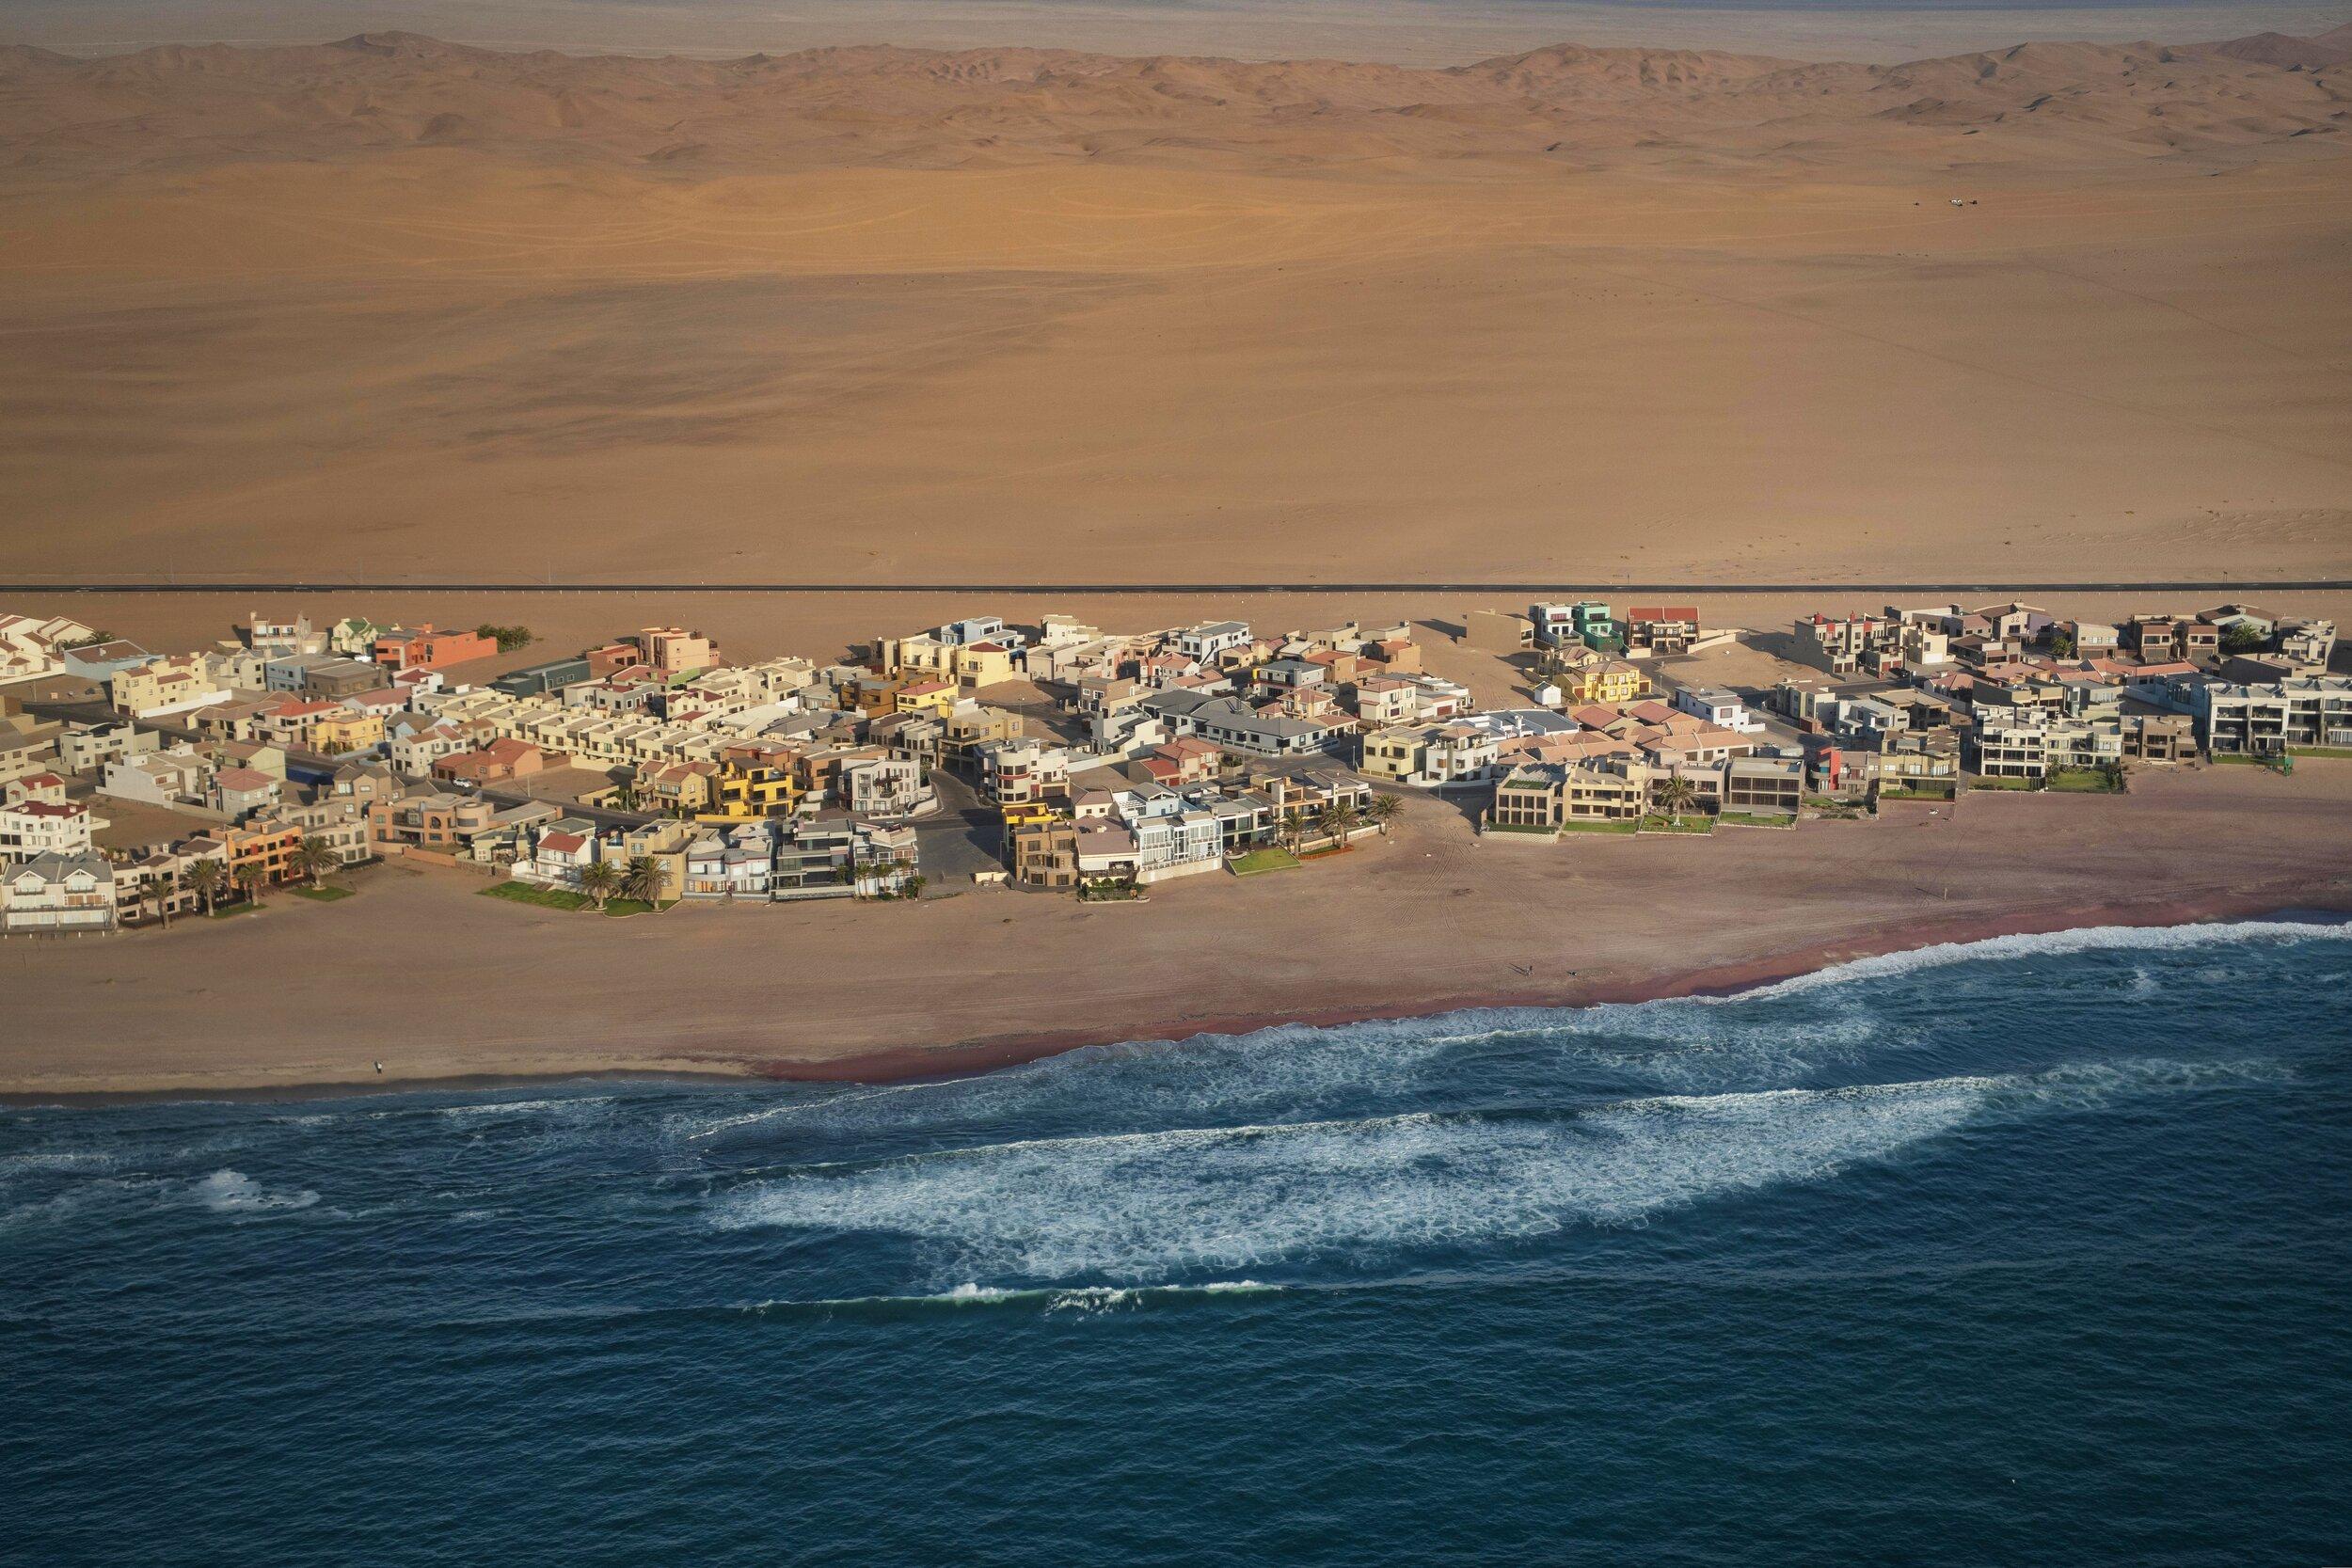 Martin-Krolop-Namibia-digitalEVENT_1.jpg